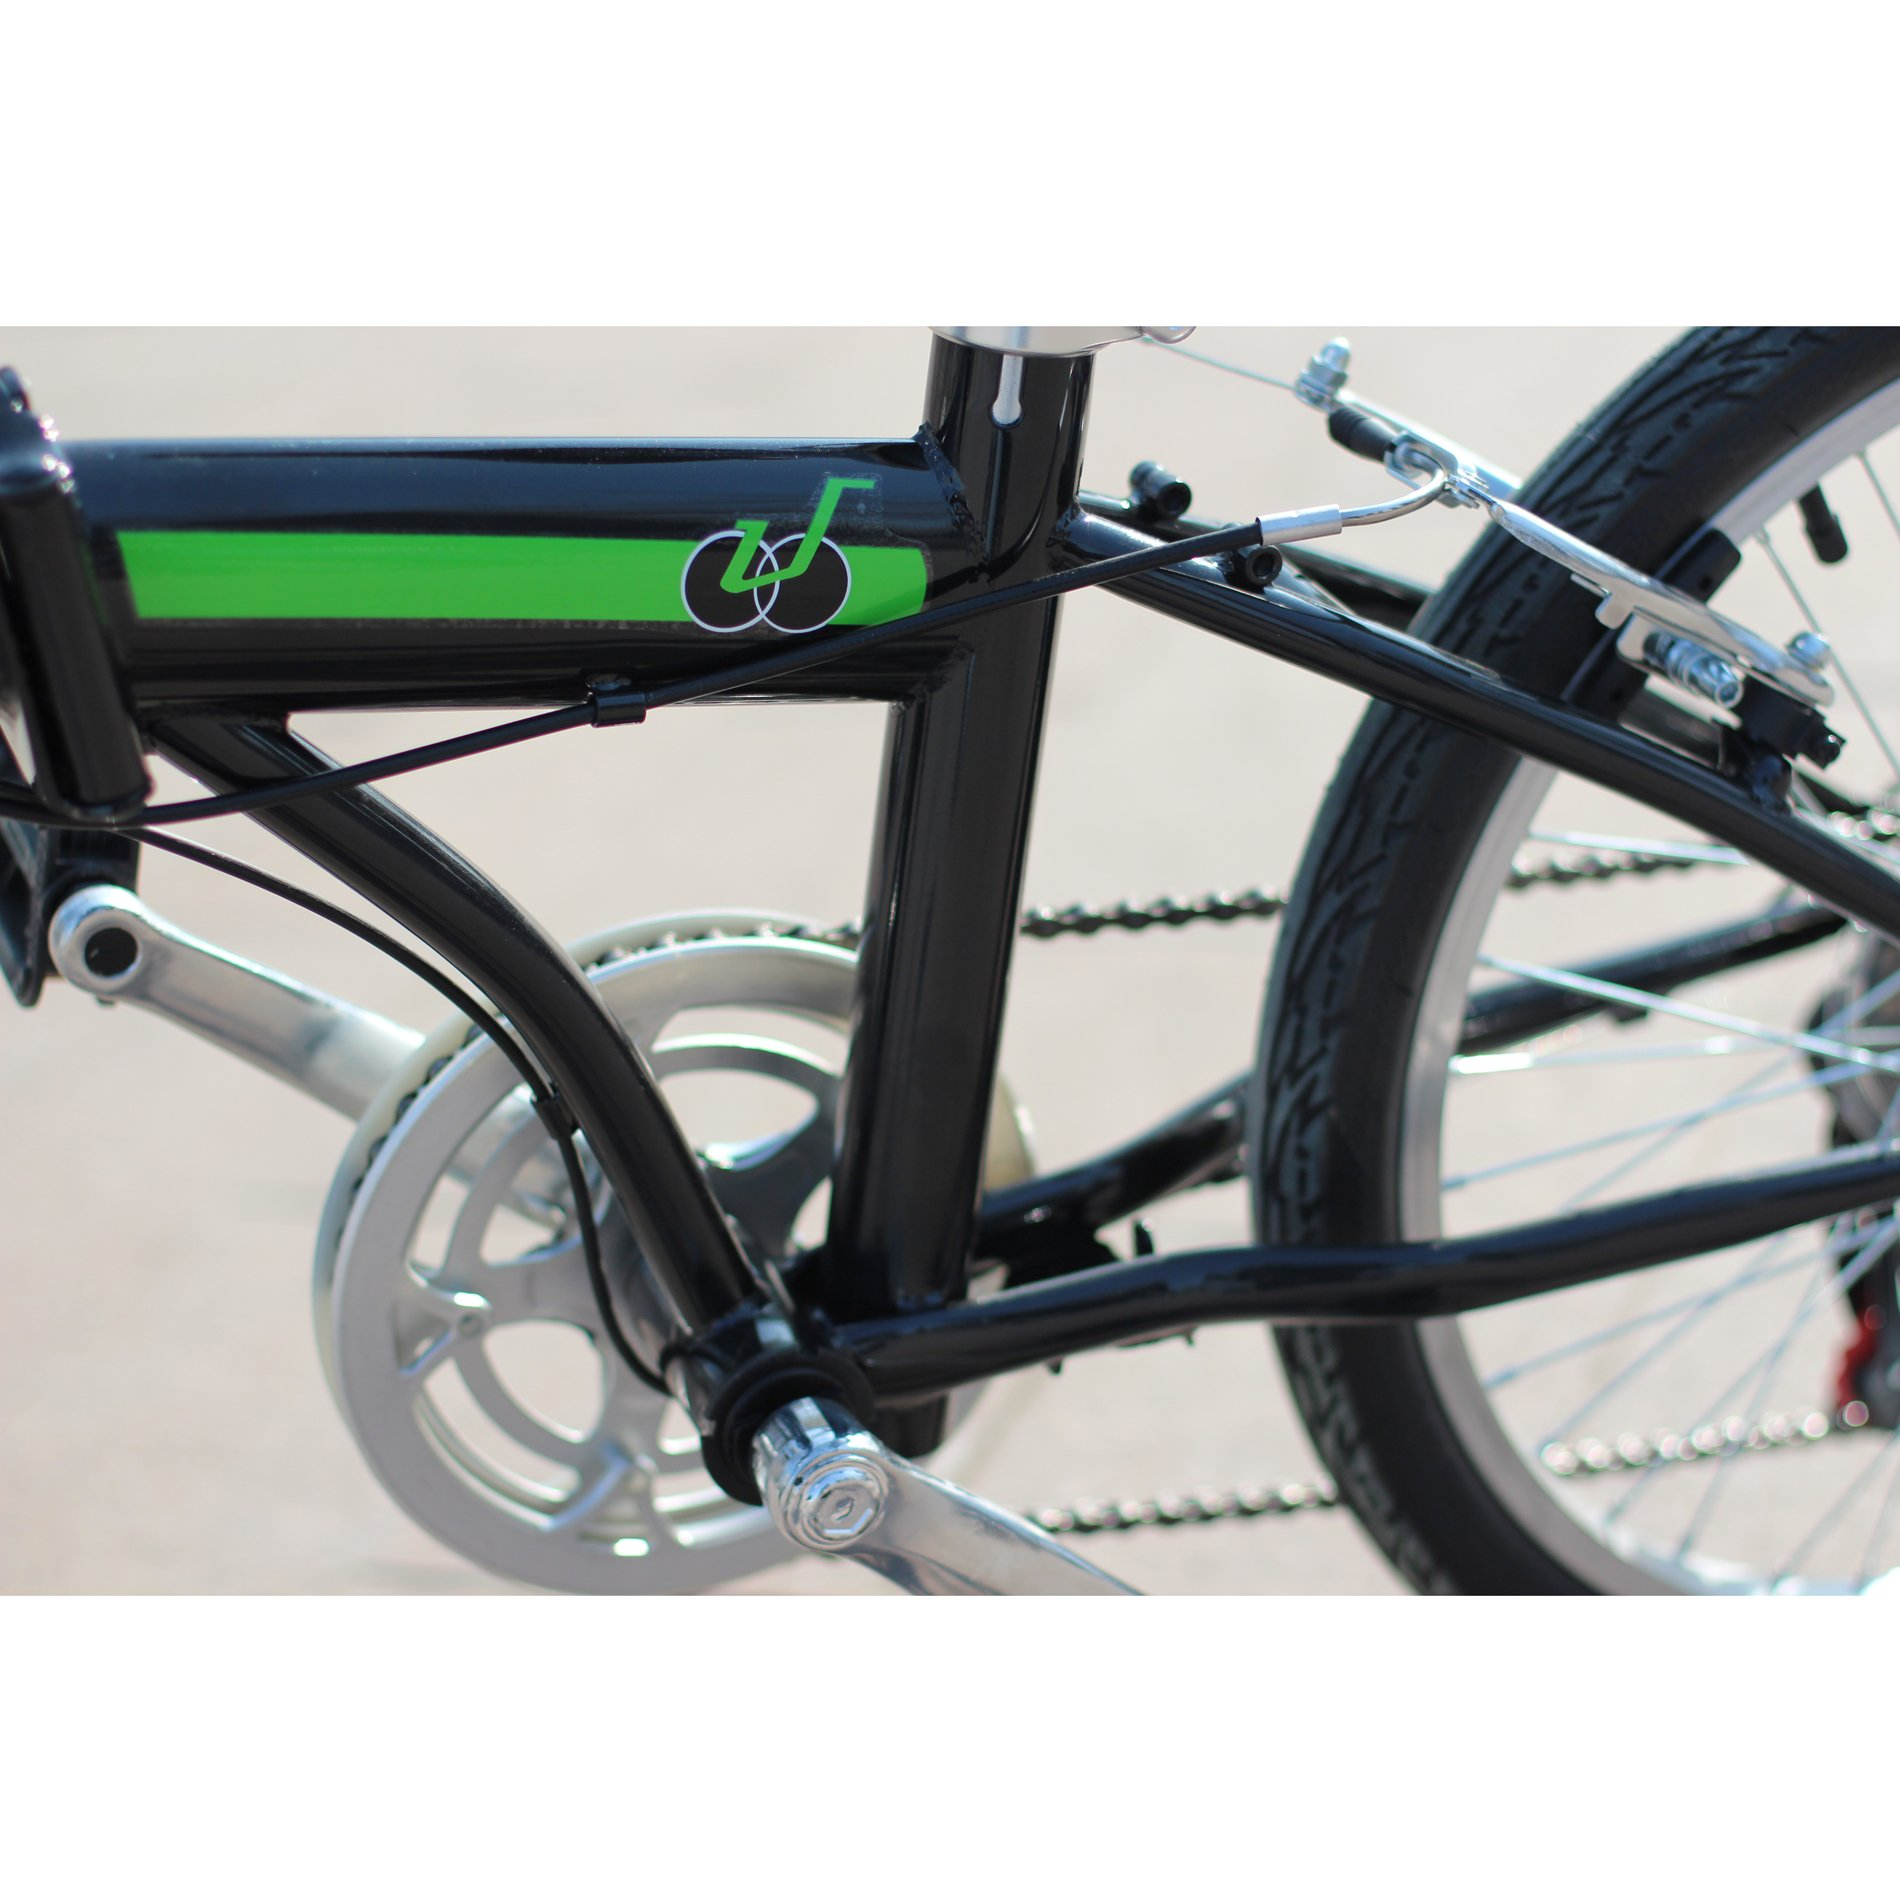 IDS Home Unyousual U Arc Folding City Bike Bicycle 6 Speed Steel Frame Shimano Gear Wanda Tire, Black by IDS Home (Image #4)